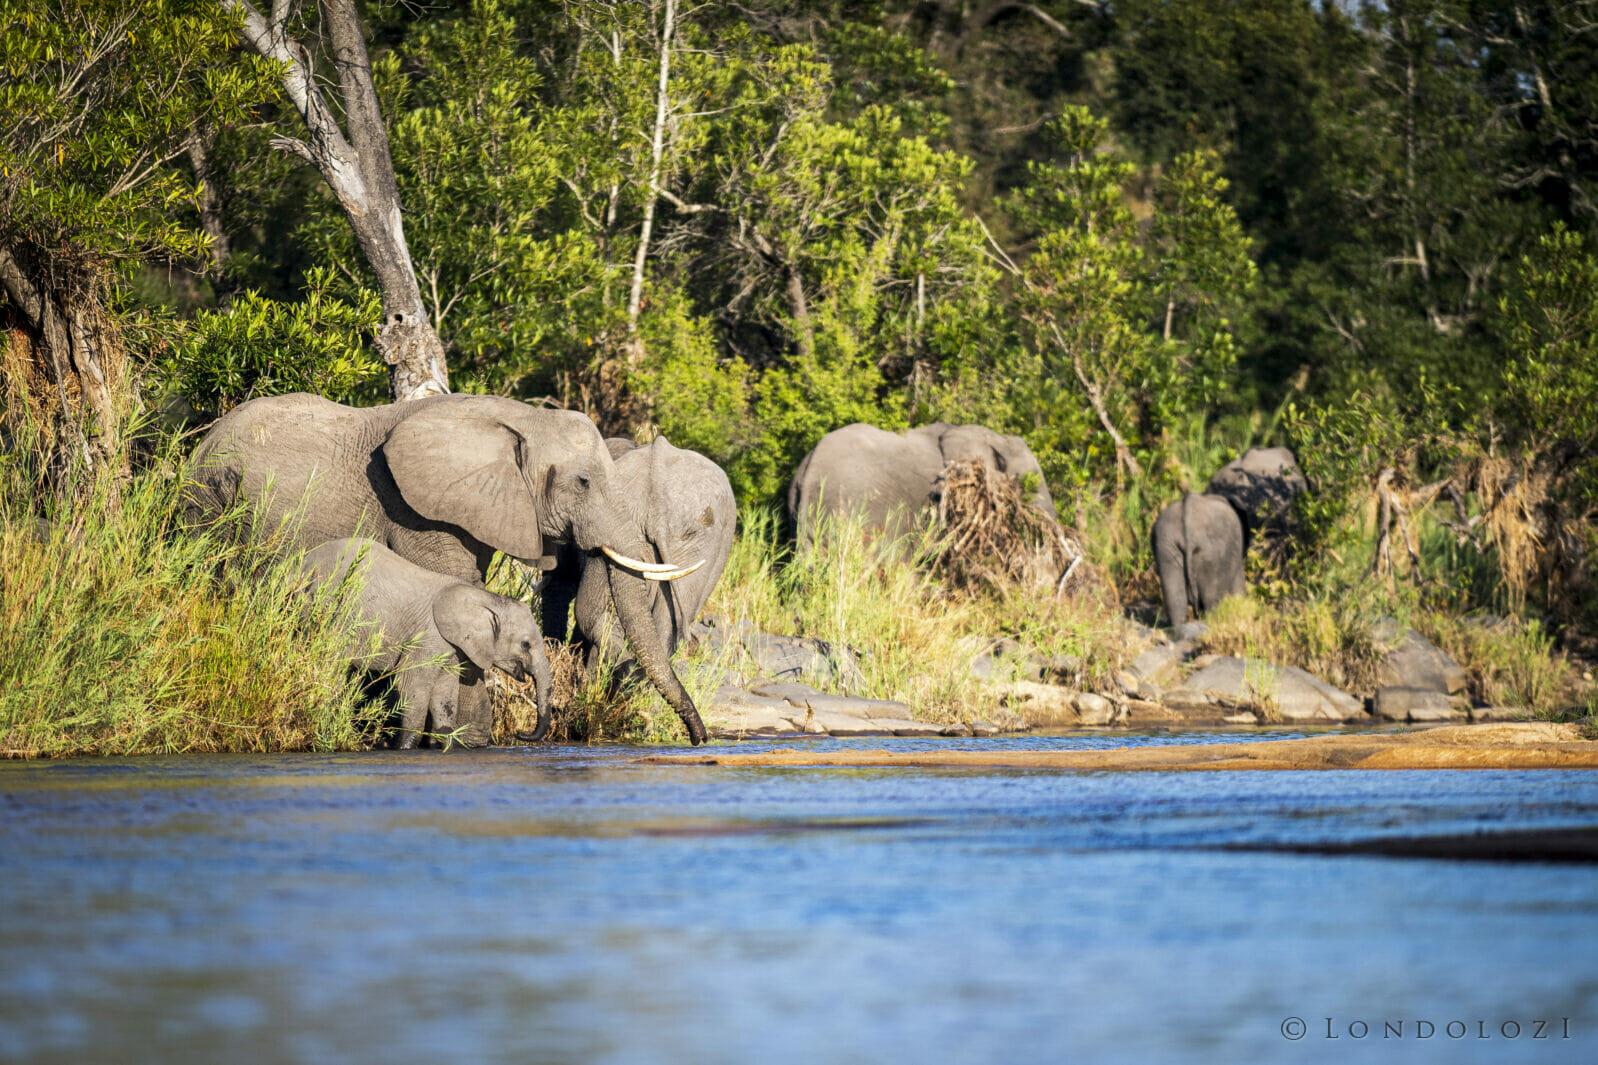 SDZ Elephants drinking Taylors crossing